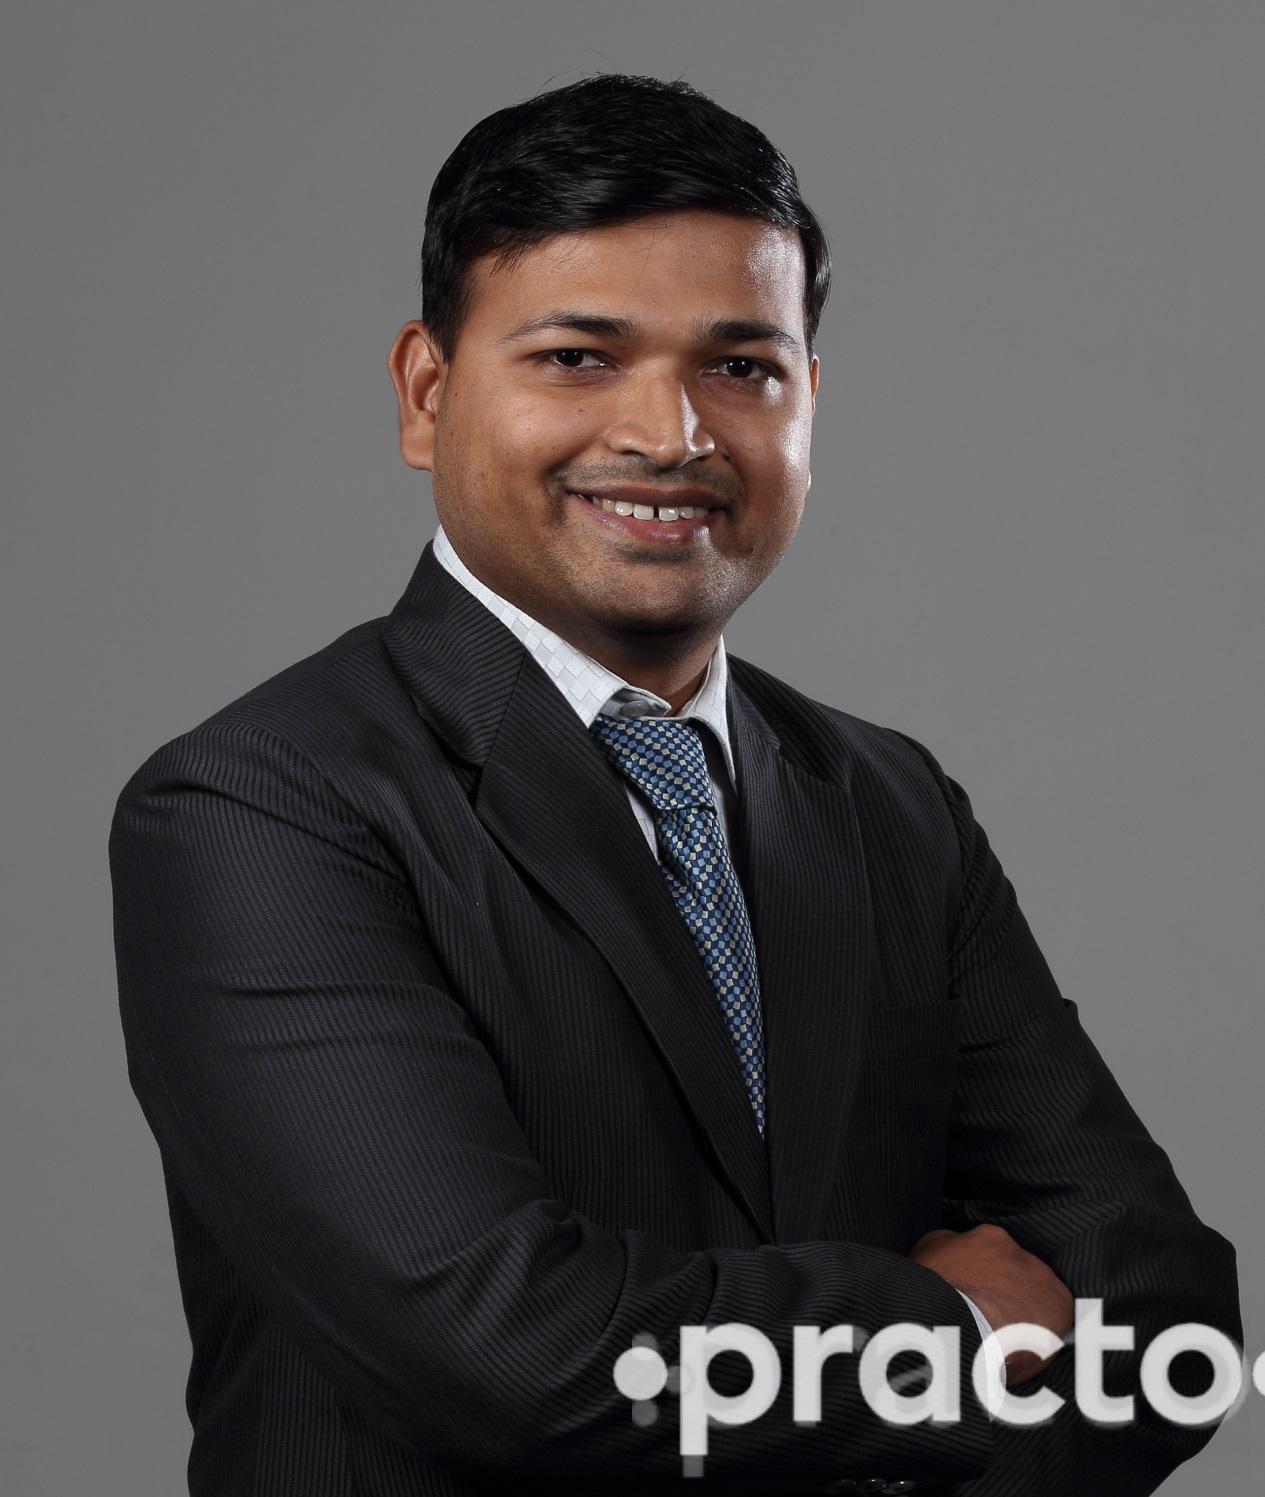 Dr. Hemant Patel - Ophthalmologist